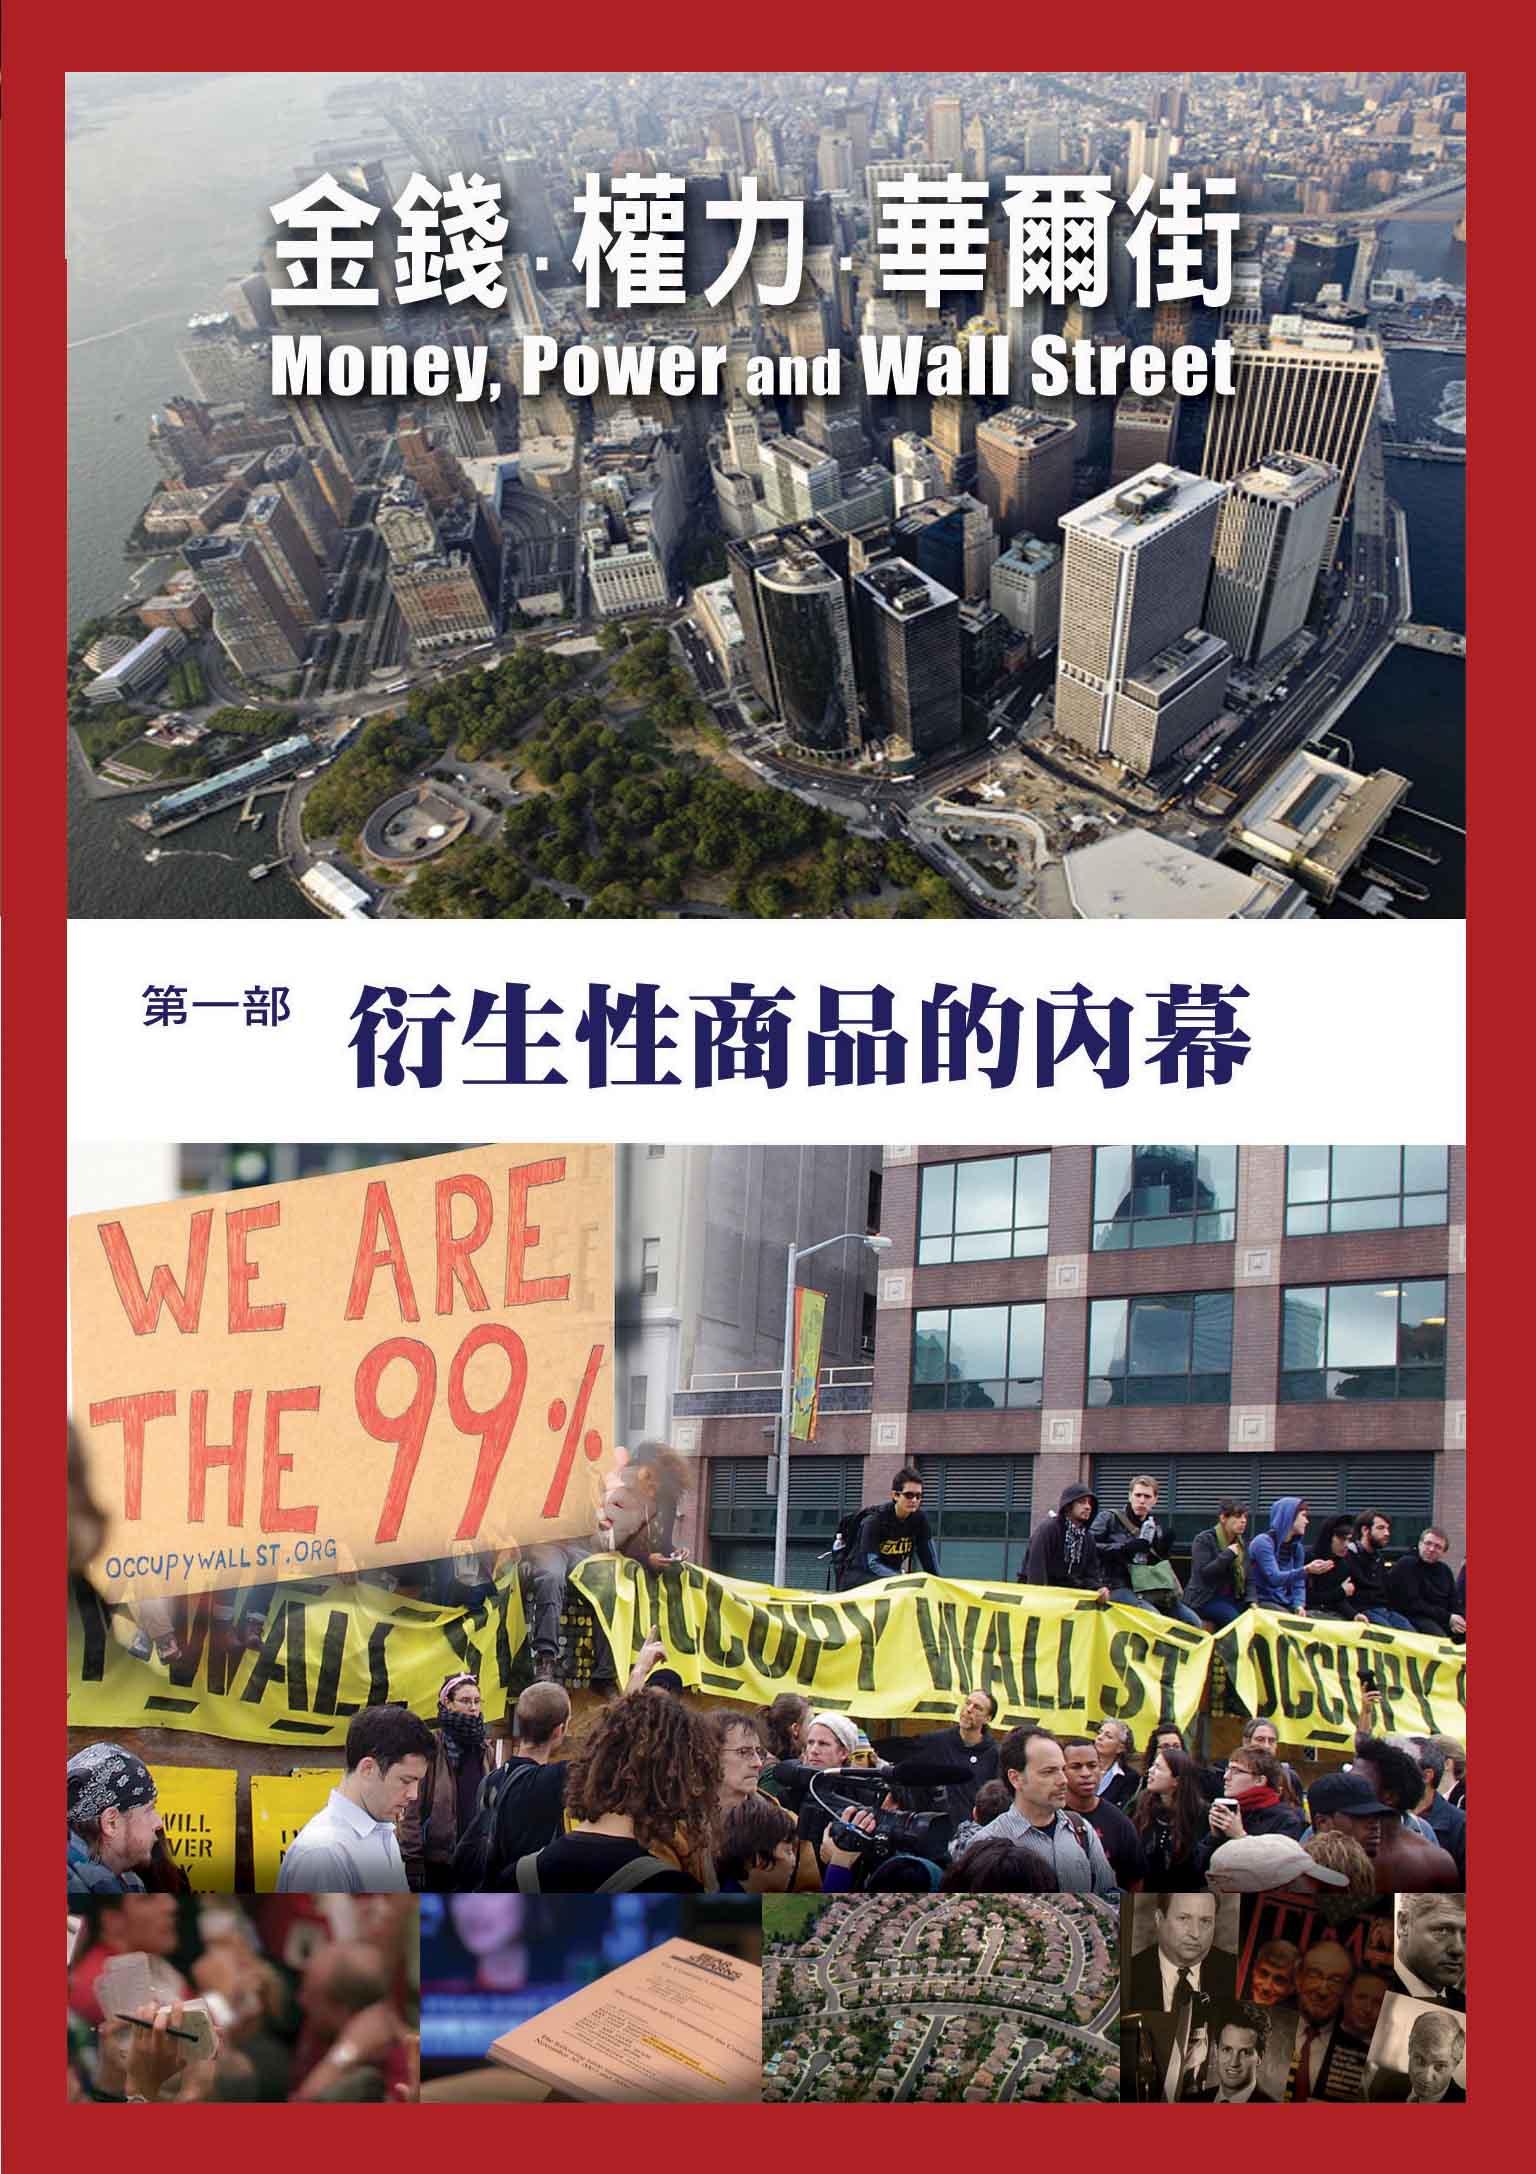 金錢.權力.華爾街 Money, Power and Wall Street [錄影資料] =